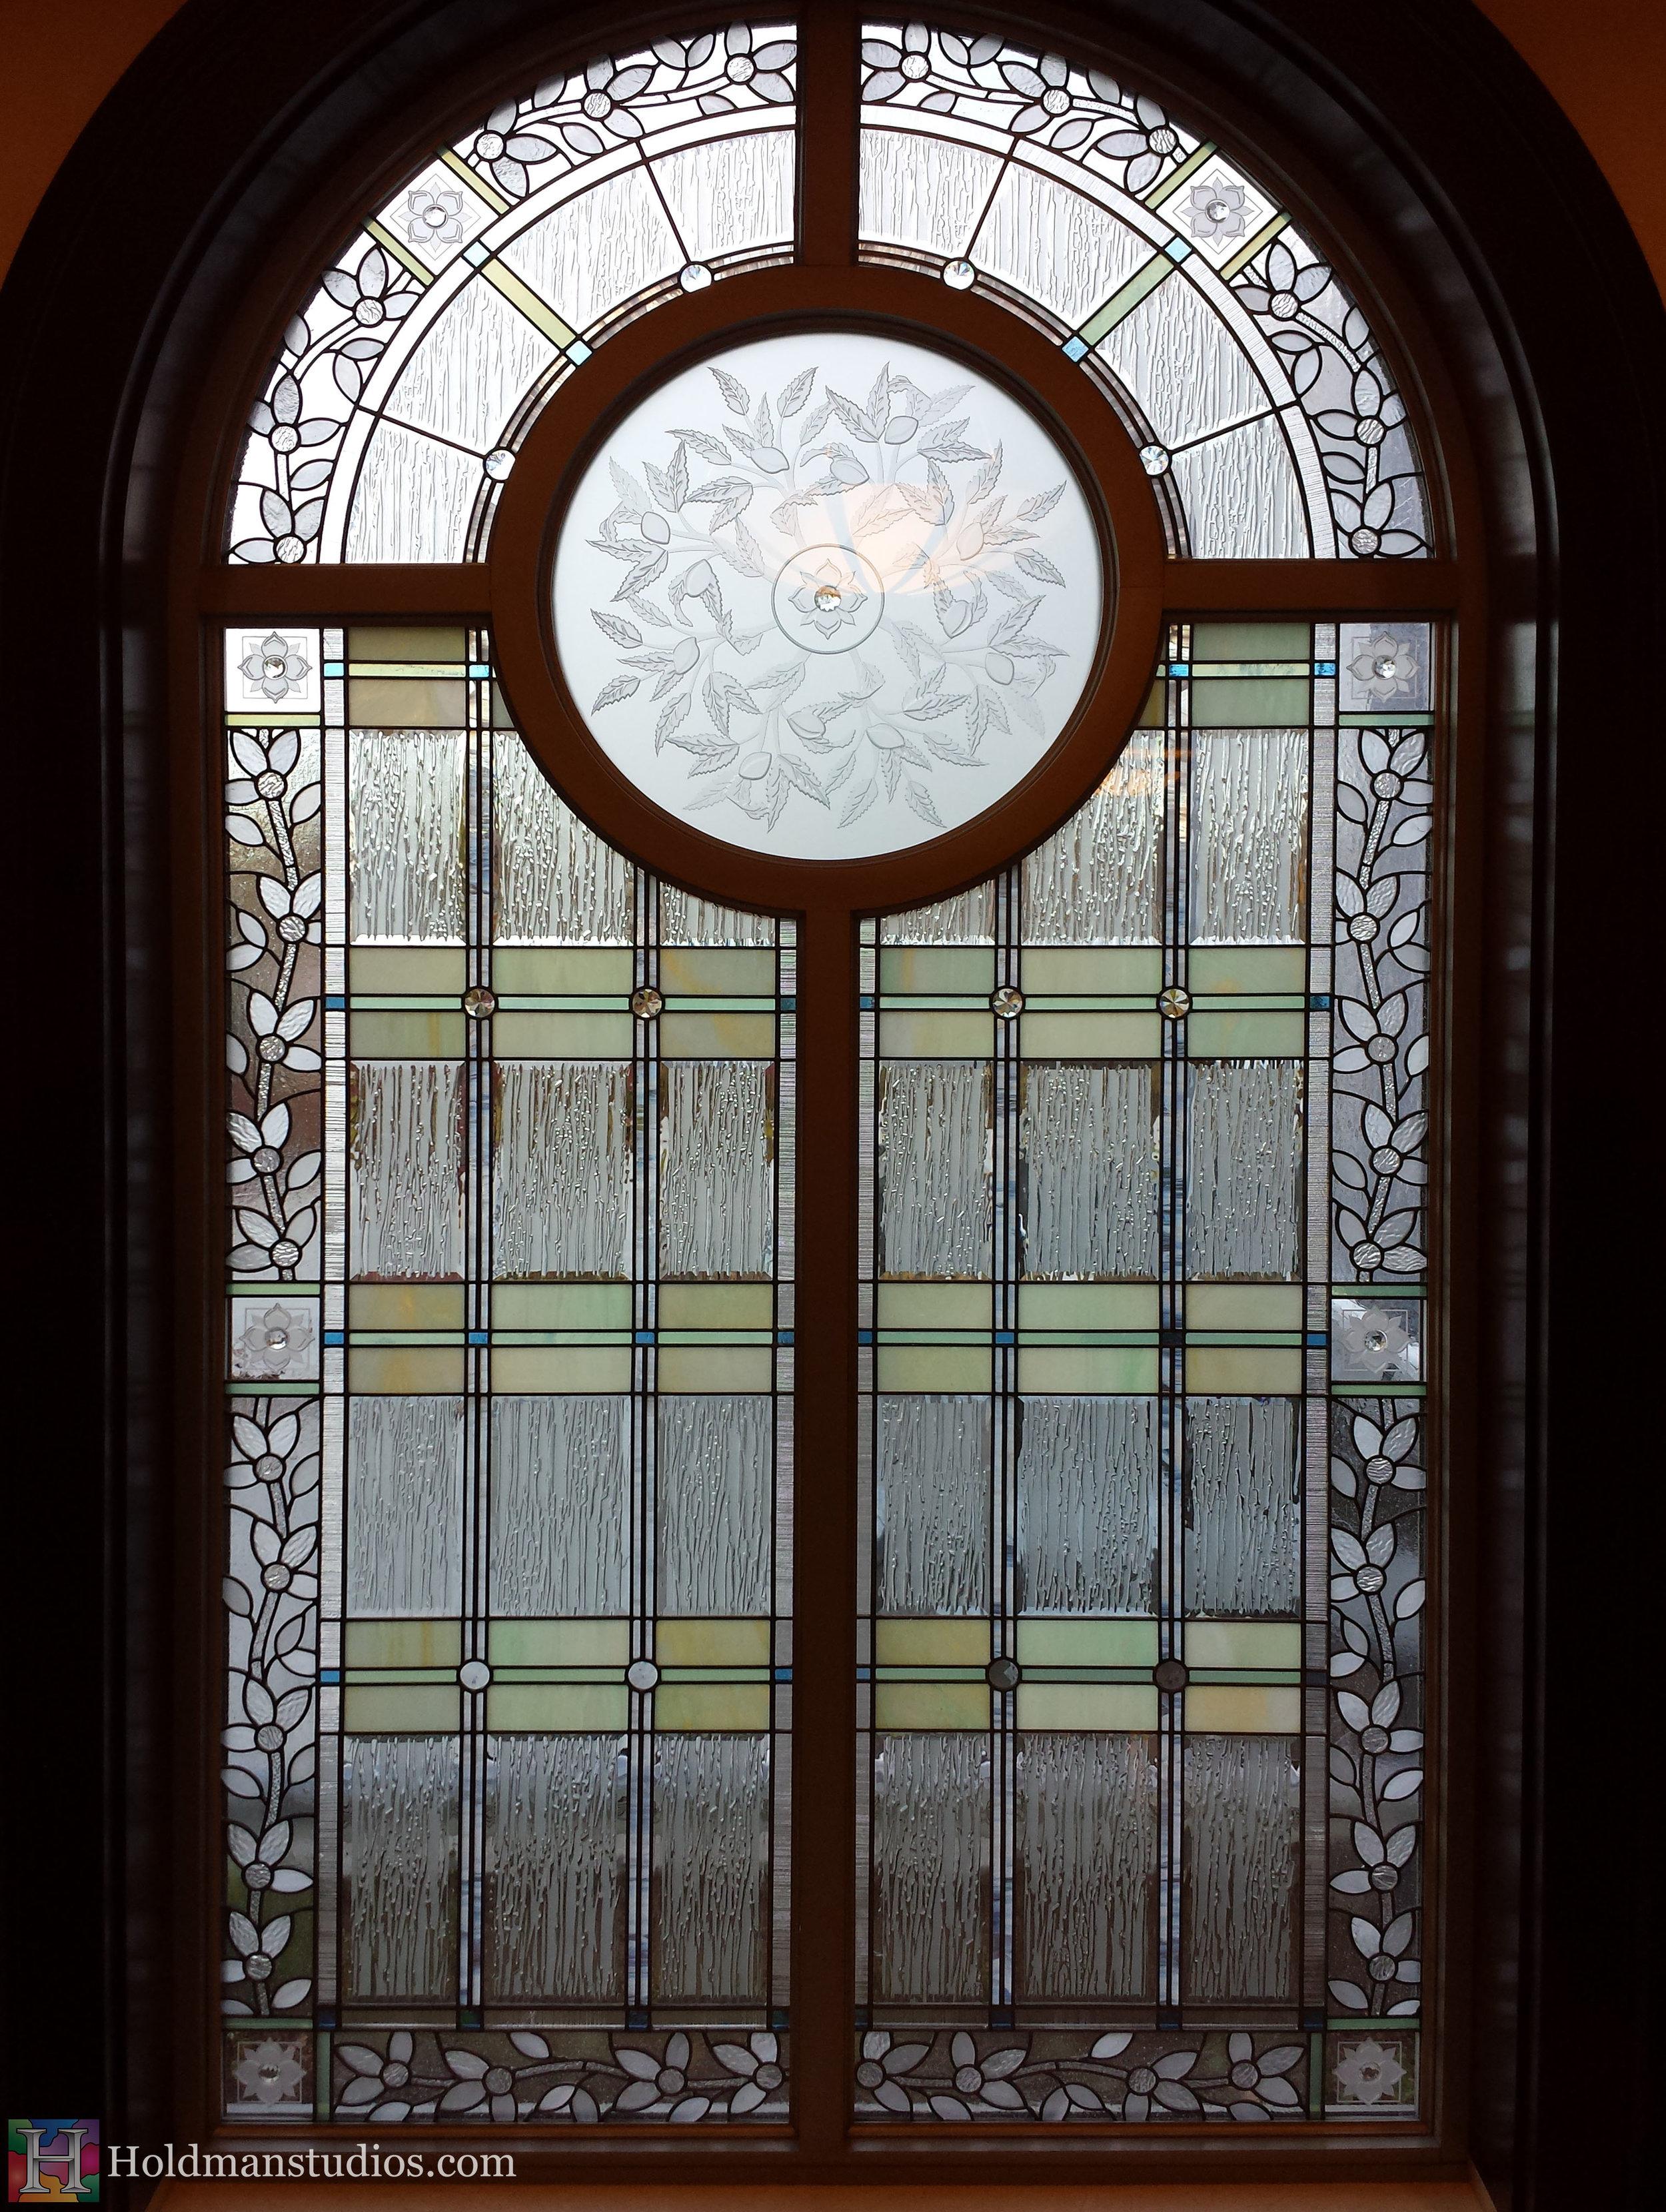 Holdman_Studios_Stained_Art_Glass_LDS_Mormon_Temple_Boise_Idaho_Potato_Flower_Rose_Window.jpg